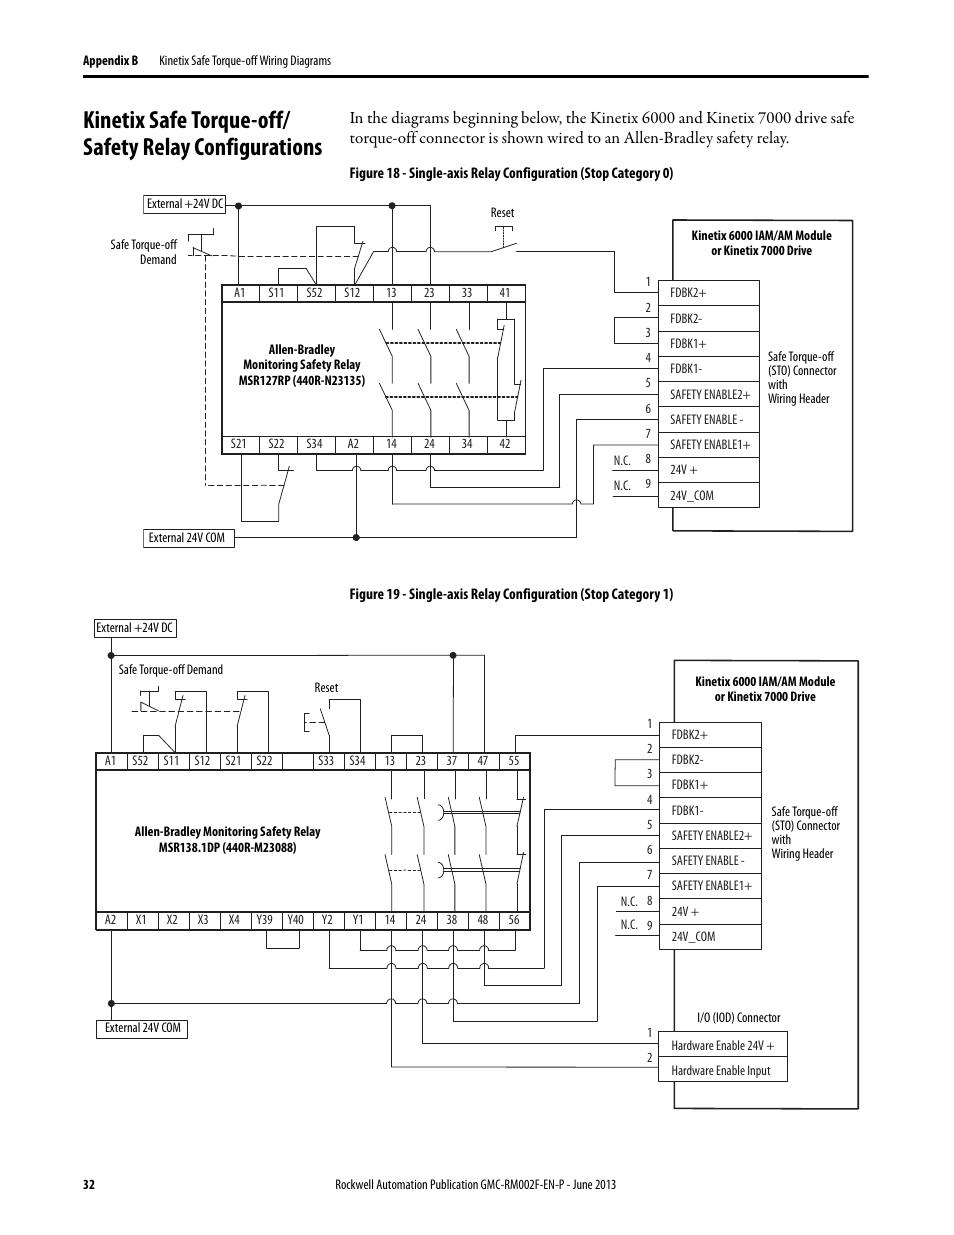 [FPWZ_2684]  Wiring Diagram For Kenwood Kdc Mp225 - Wiring Diagram Schemes | Kenwood Model Kdc X598 Wiring Diagram |  | Wiring Diagram Schemes - Mein-Raetien